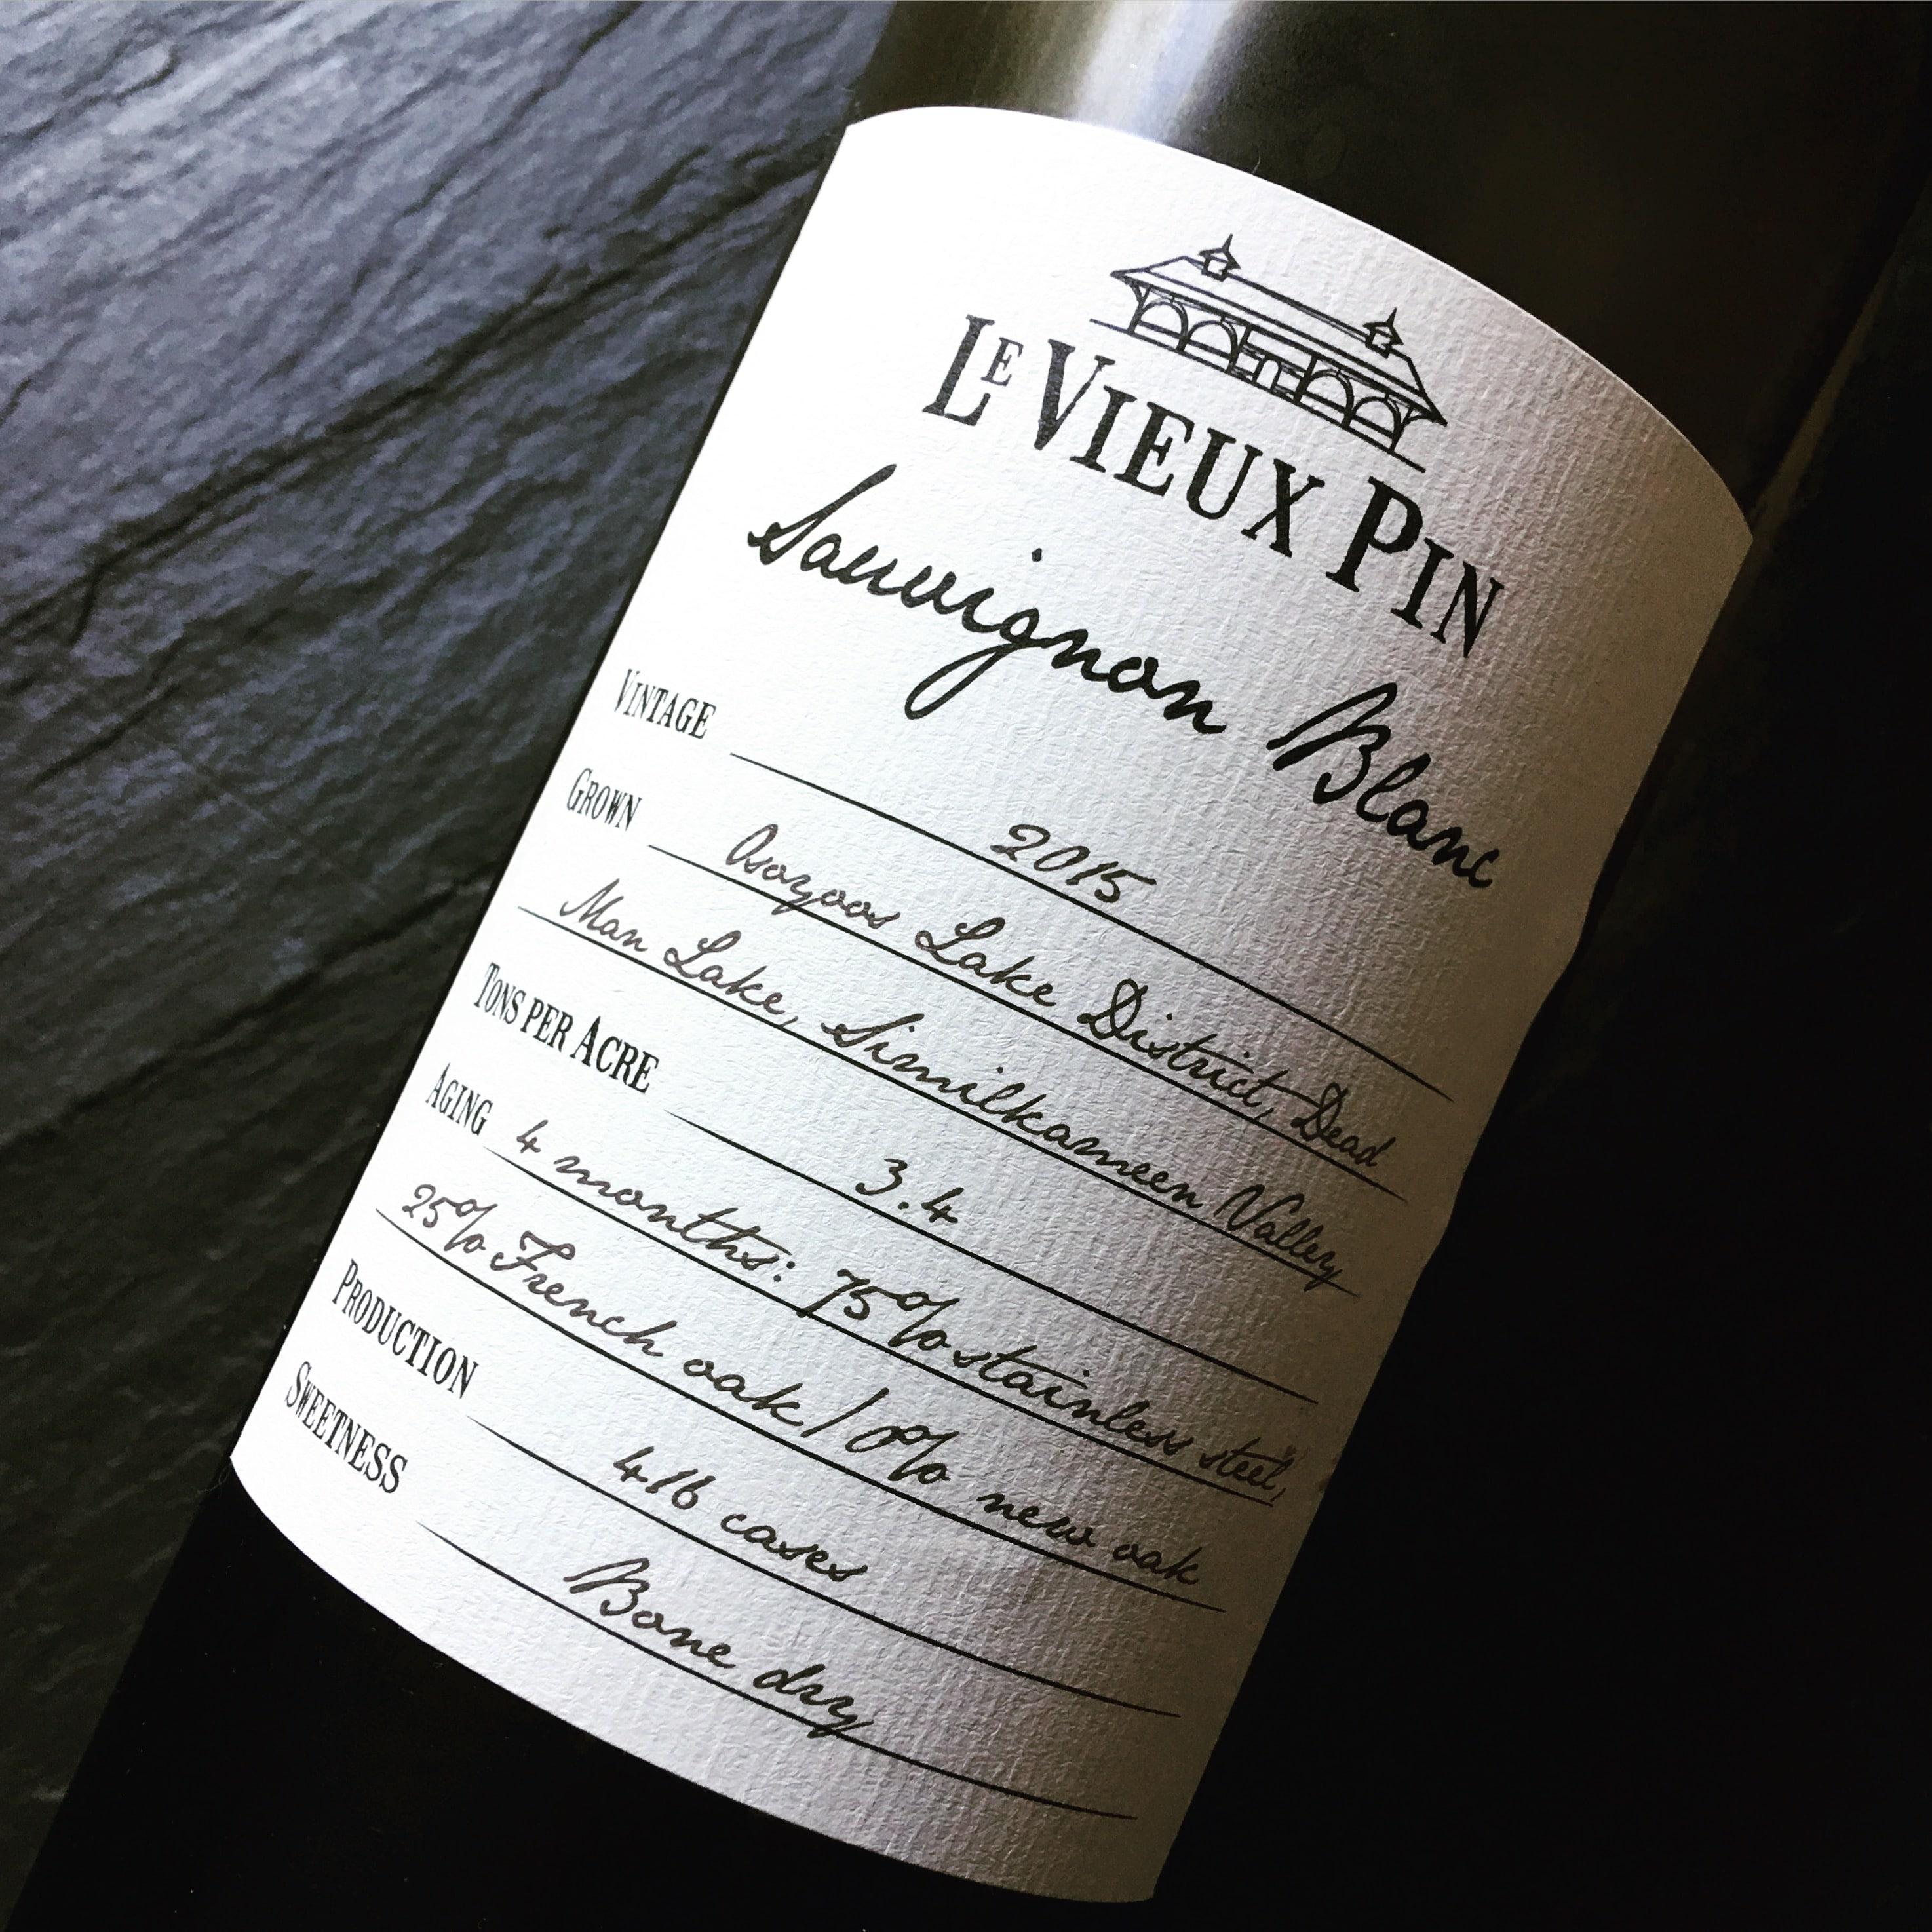 Le Vieux Pin Sauvignon Blanc 2015